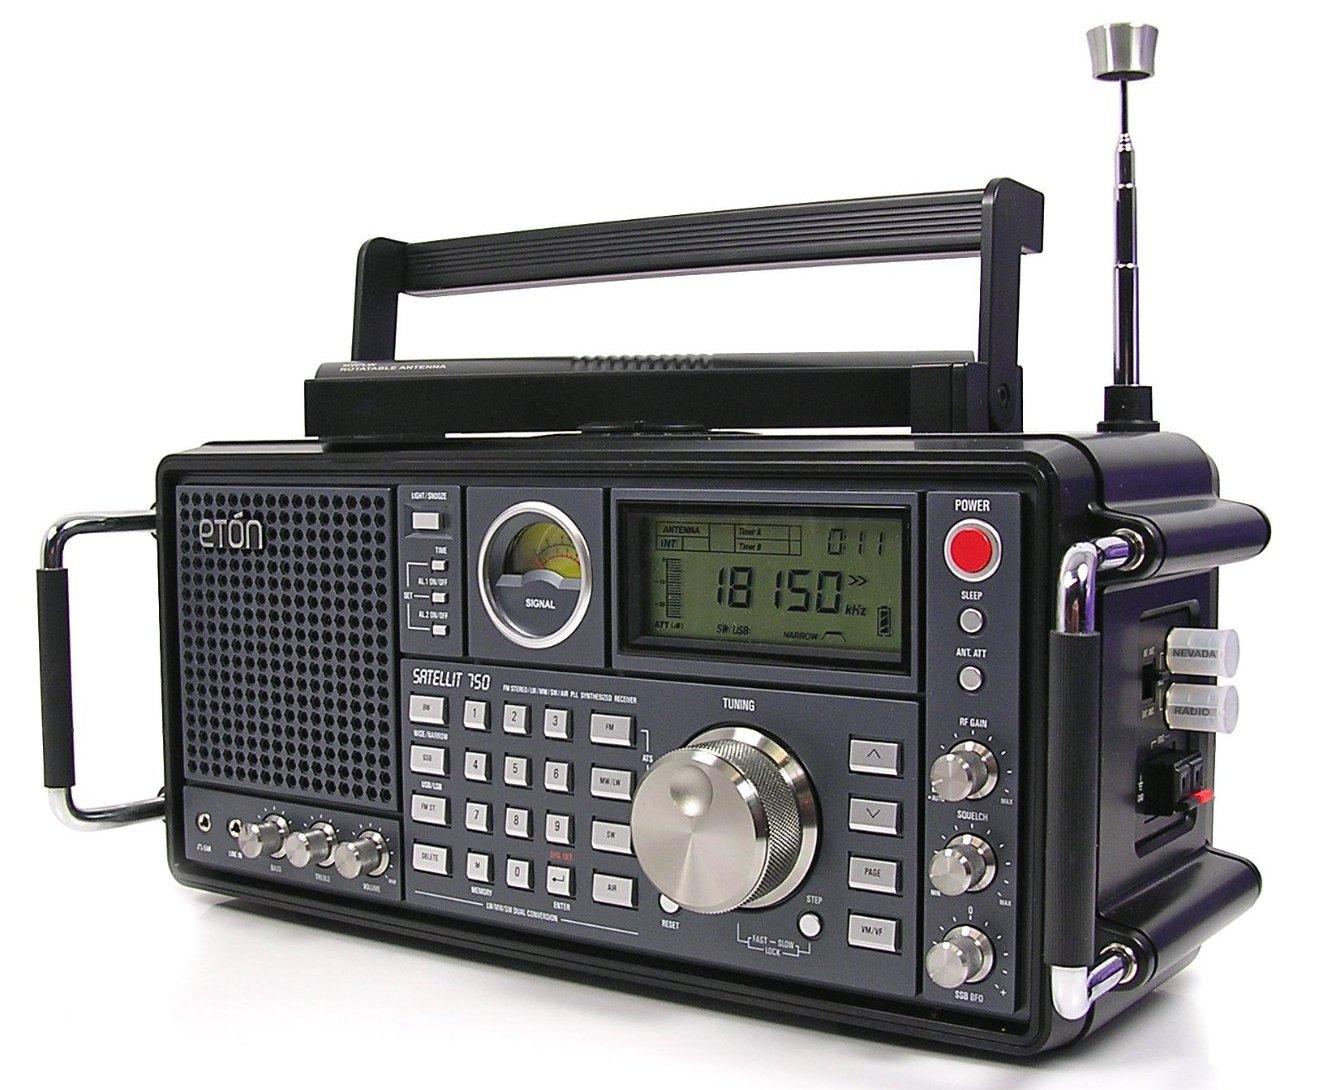 Top 5 Best Shortwave Radio in 2019: Ultimate Buyers Guide